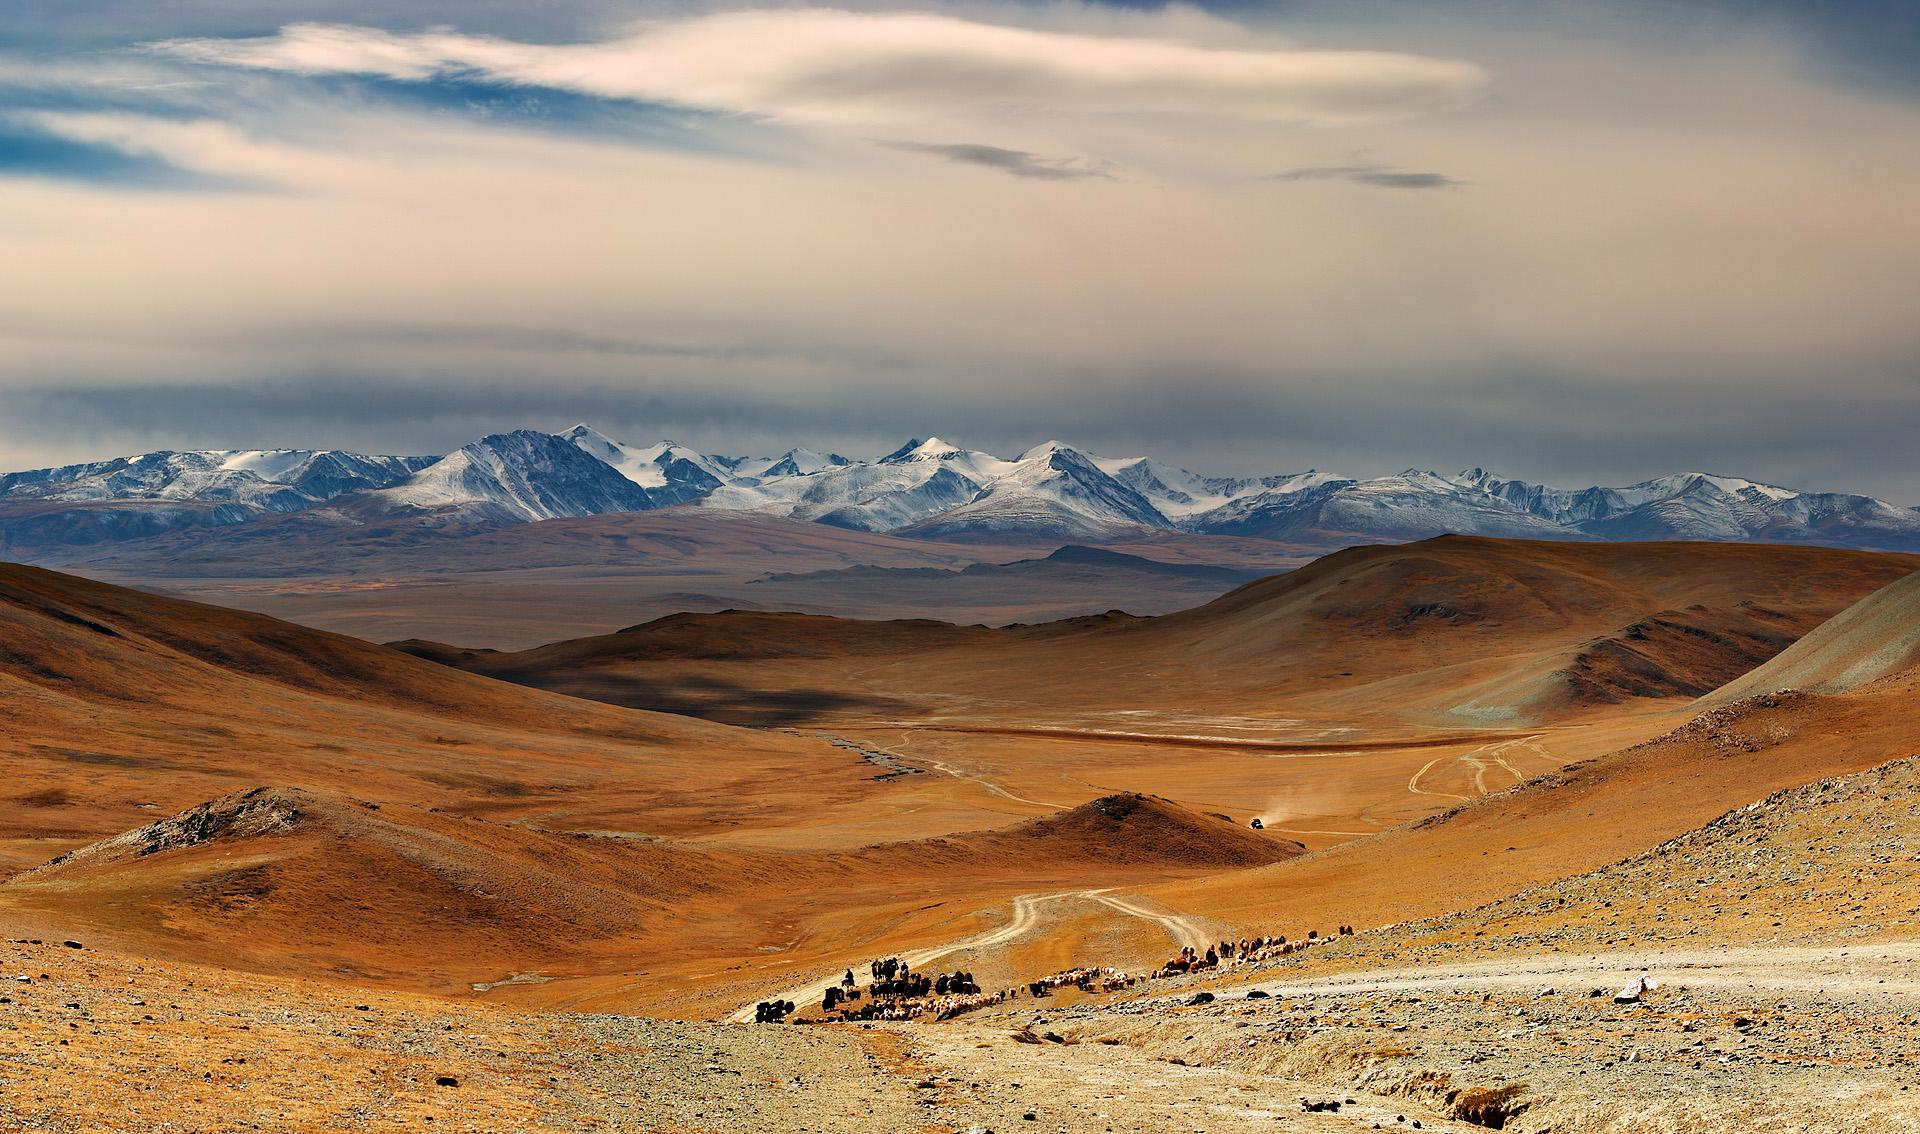 Mongolië wandelreis trektocht Khövsgöl , Khangai Nuruu, Gobi woestijn | HT & Snow Leopard 15